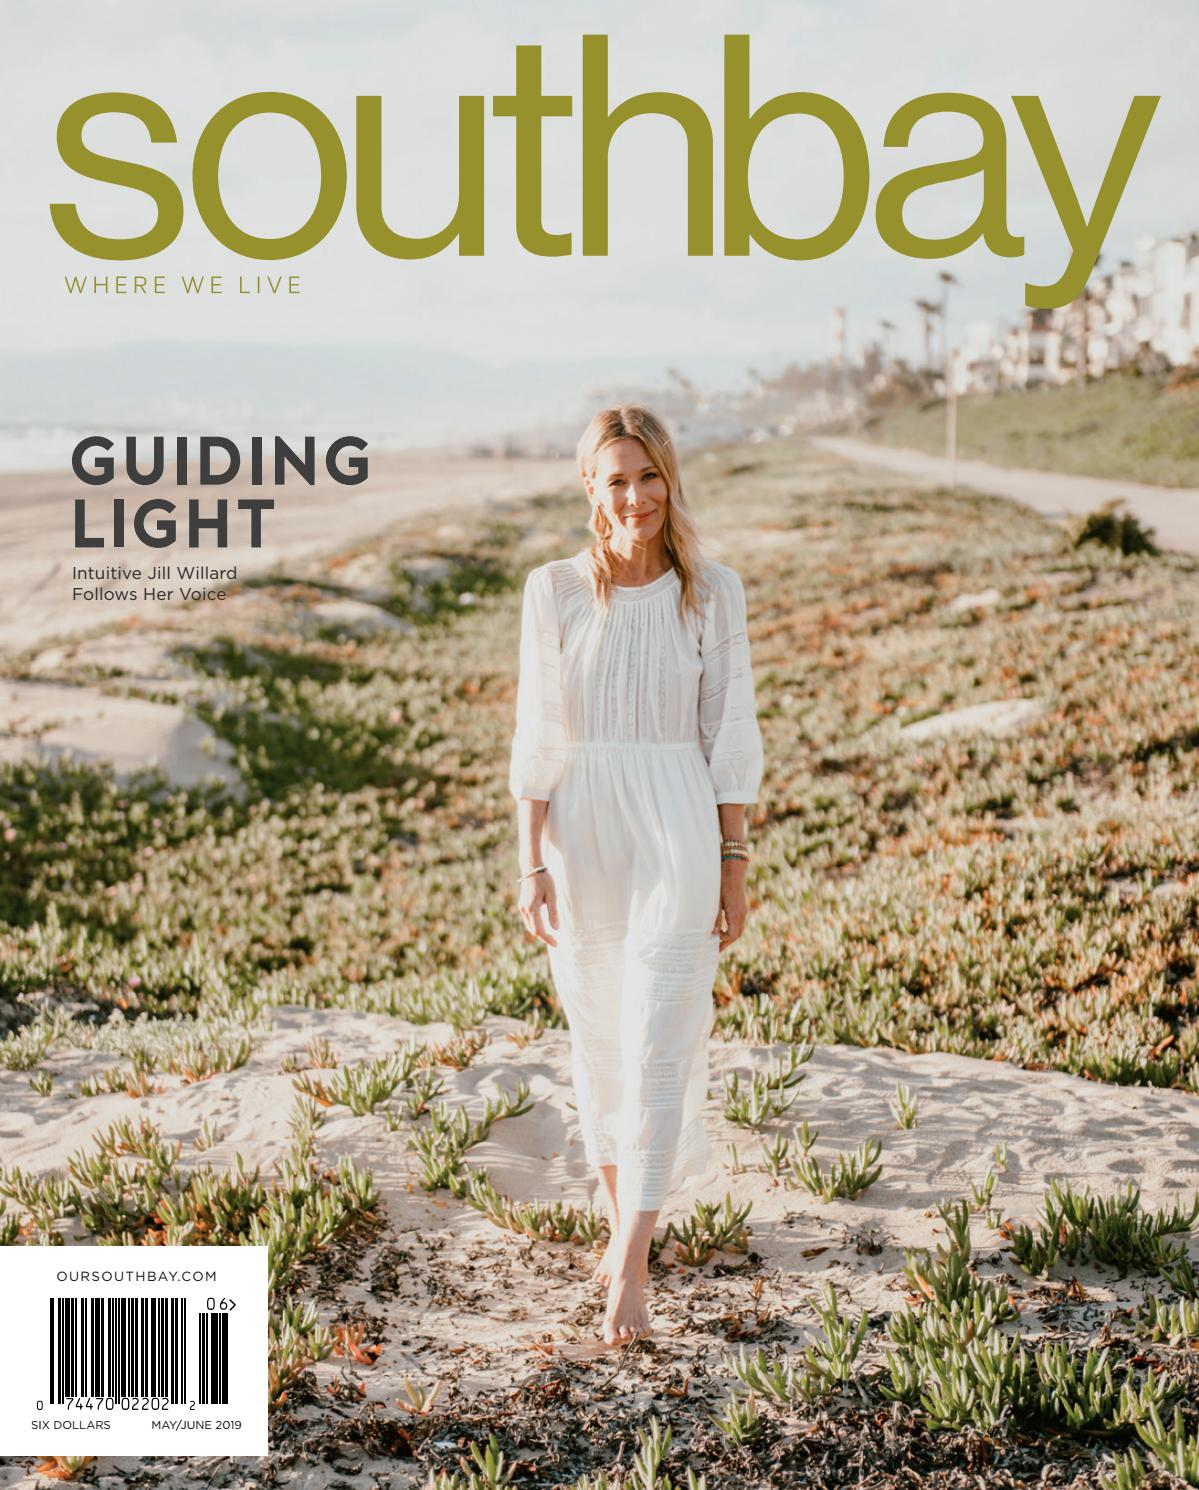 Southbay MayJune 2019 by Moon Tide Media issuu